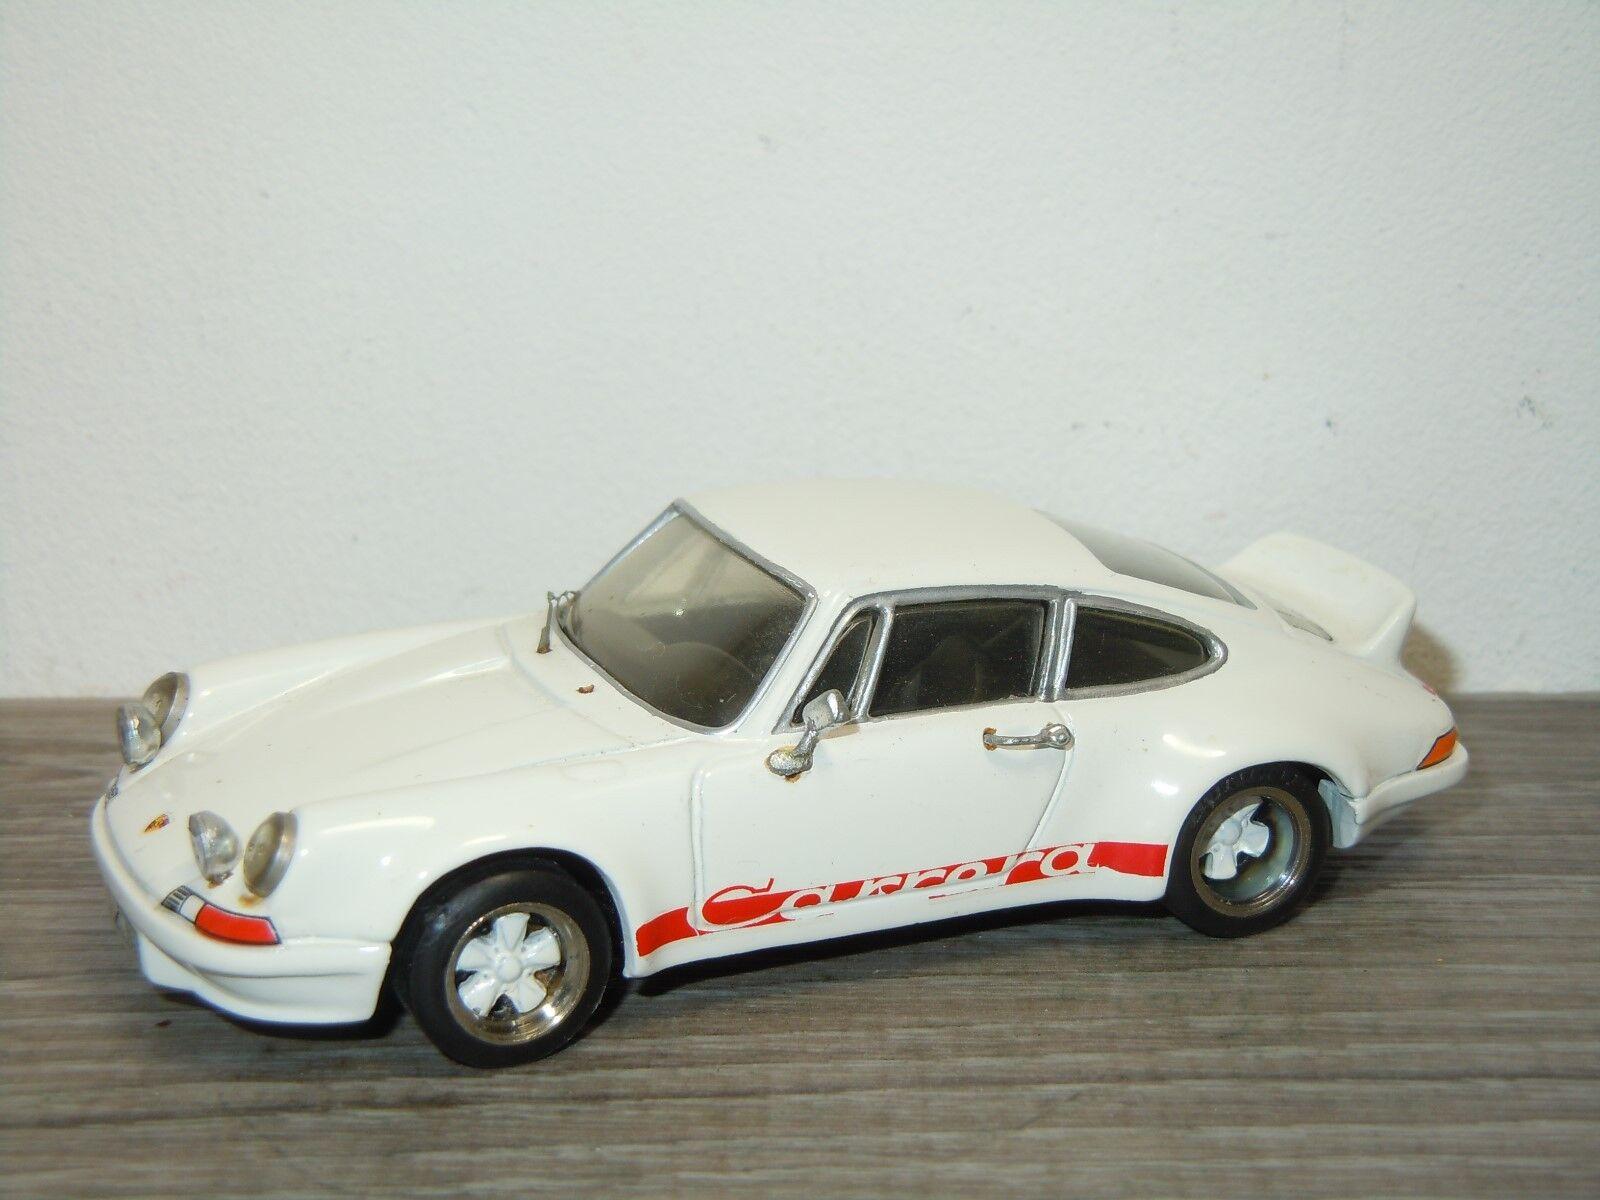 Porsche 911 Carrera RSR 2.8 - Minichamps AMR Models France 1 43 33961